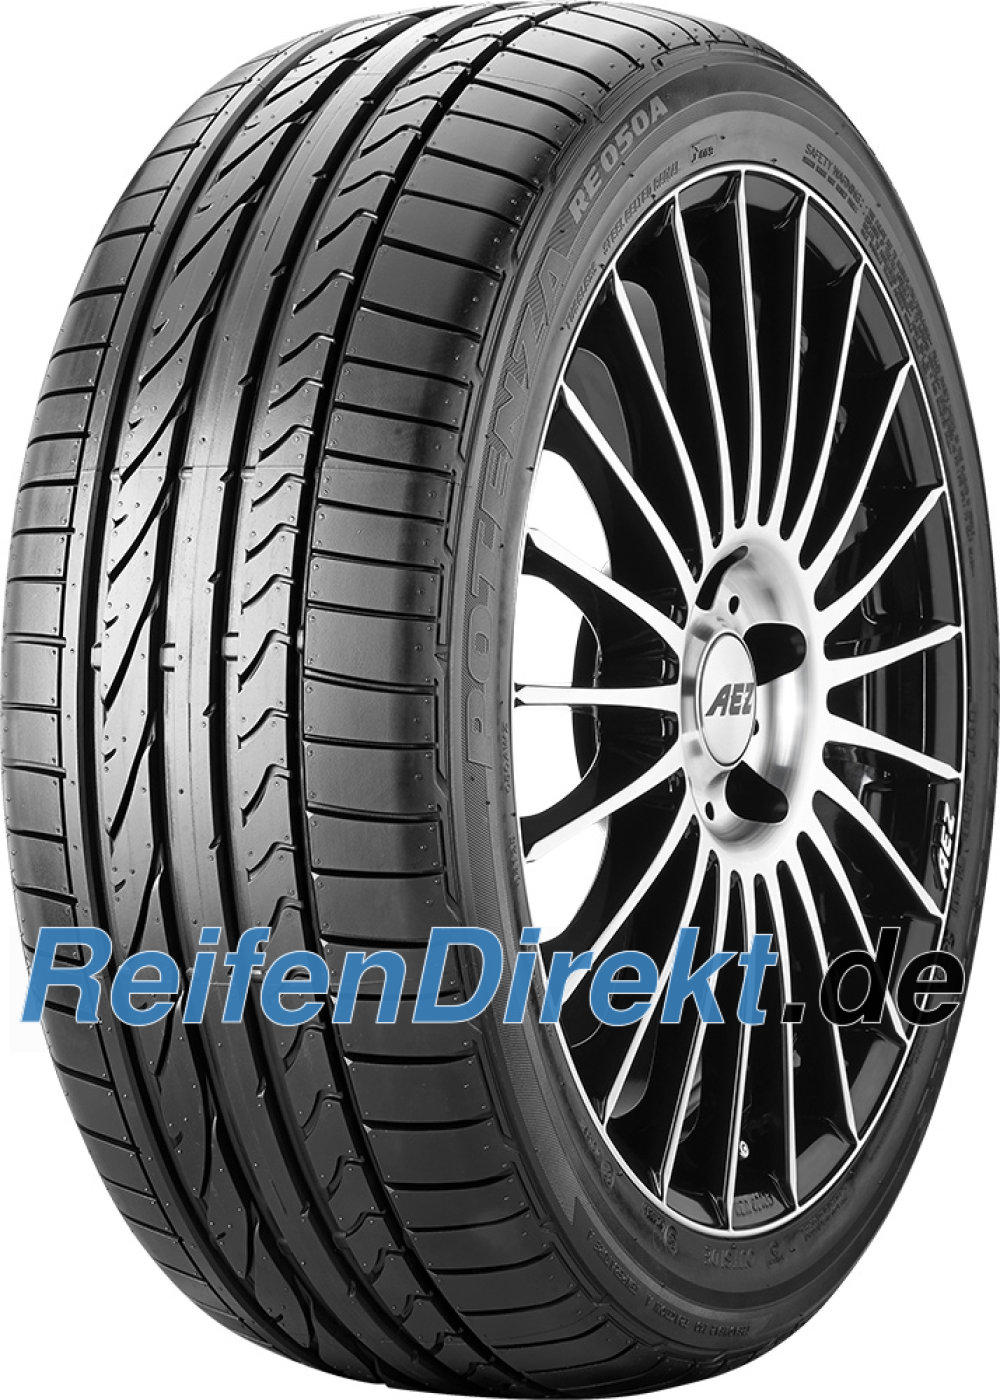 Bridgestone Potenza RE 050 A ( 245/40 R19 94W )